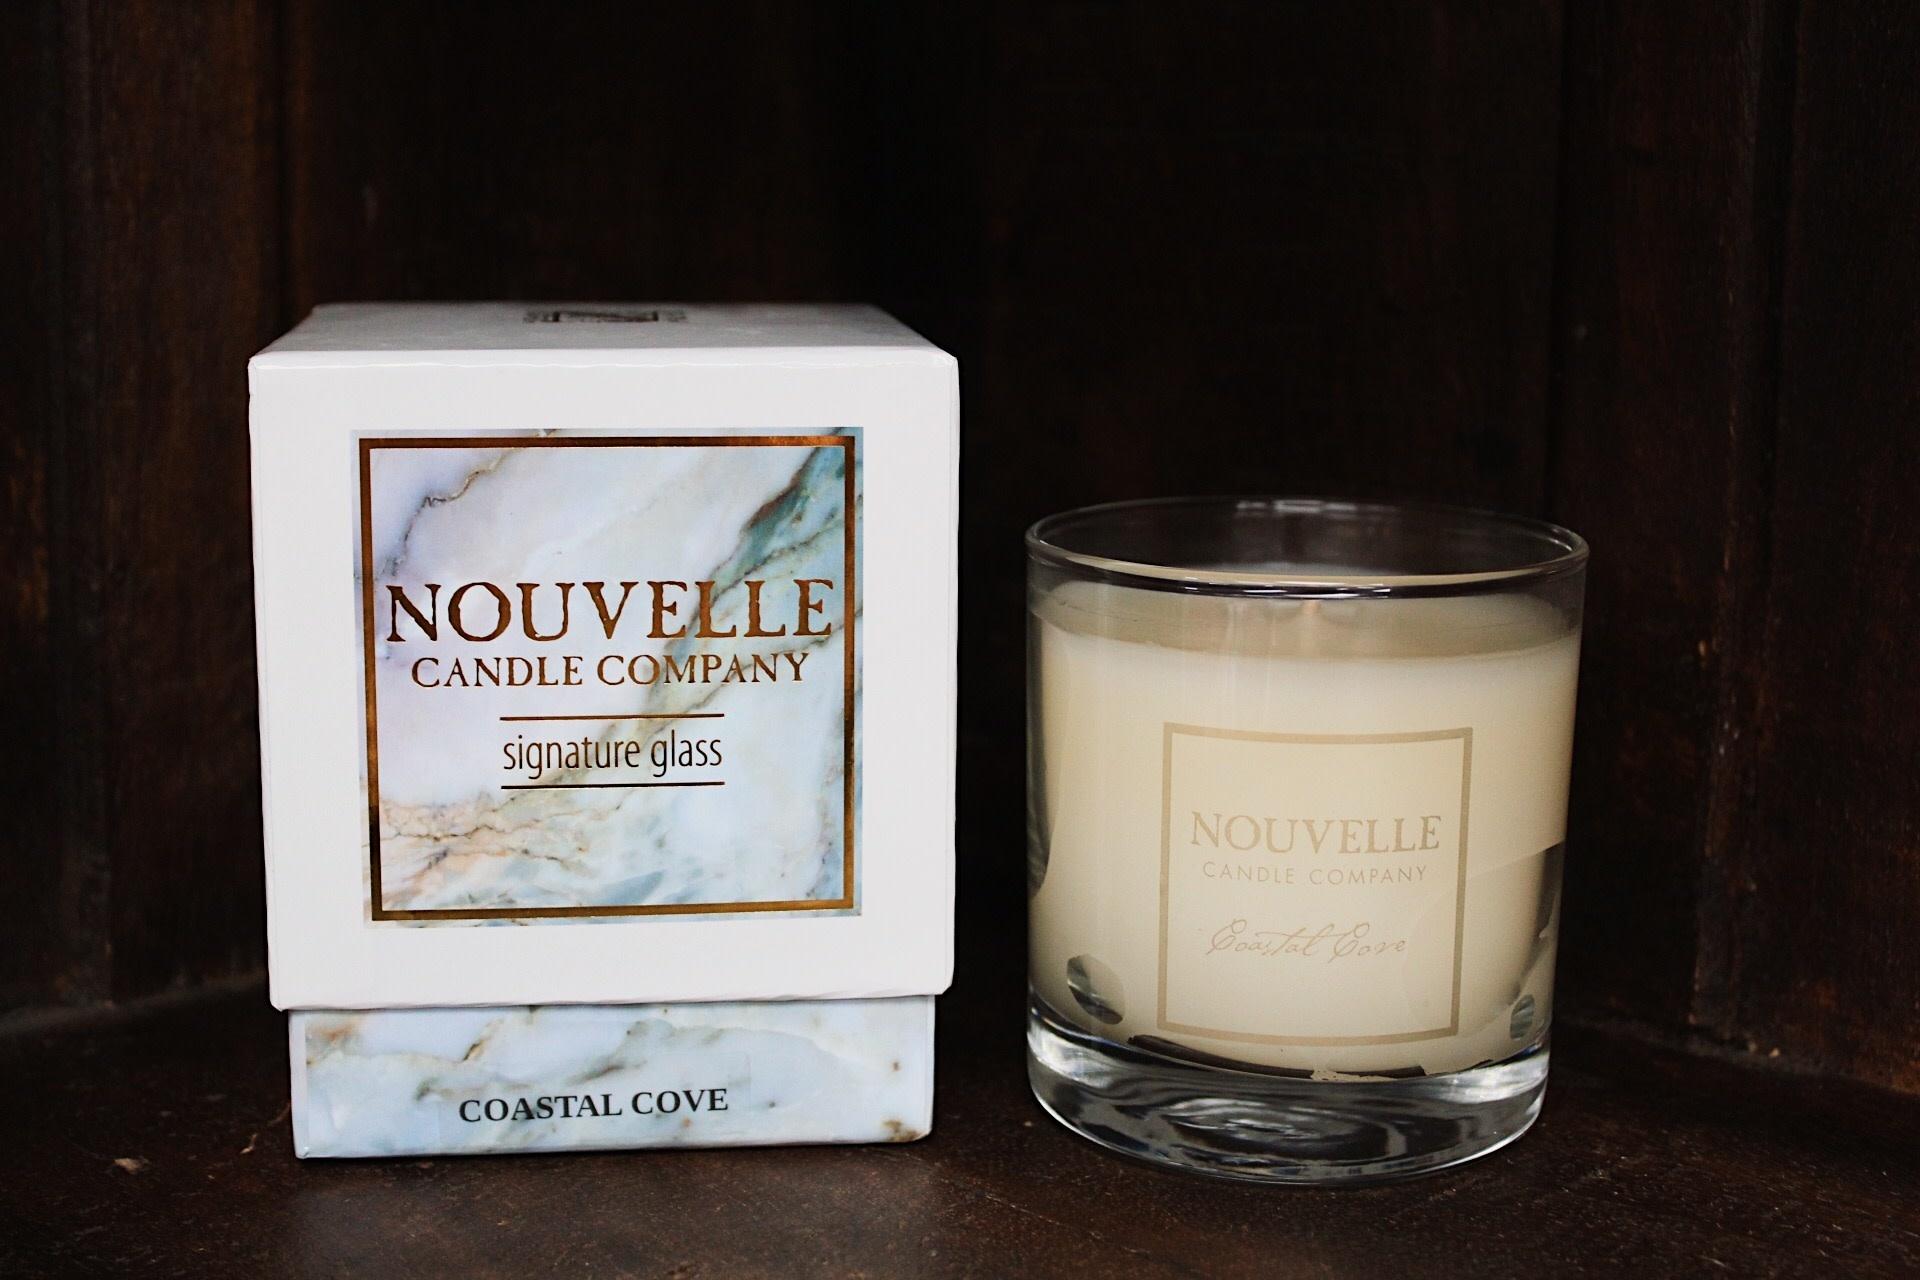 Nouvelle Candle Company Coastal Cove Large Glass